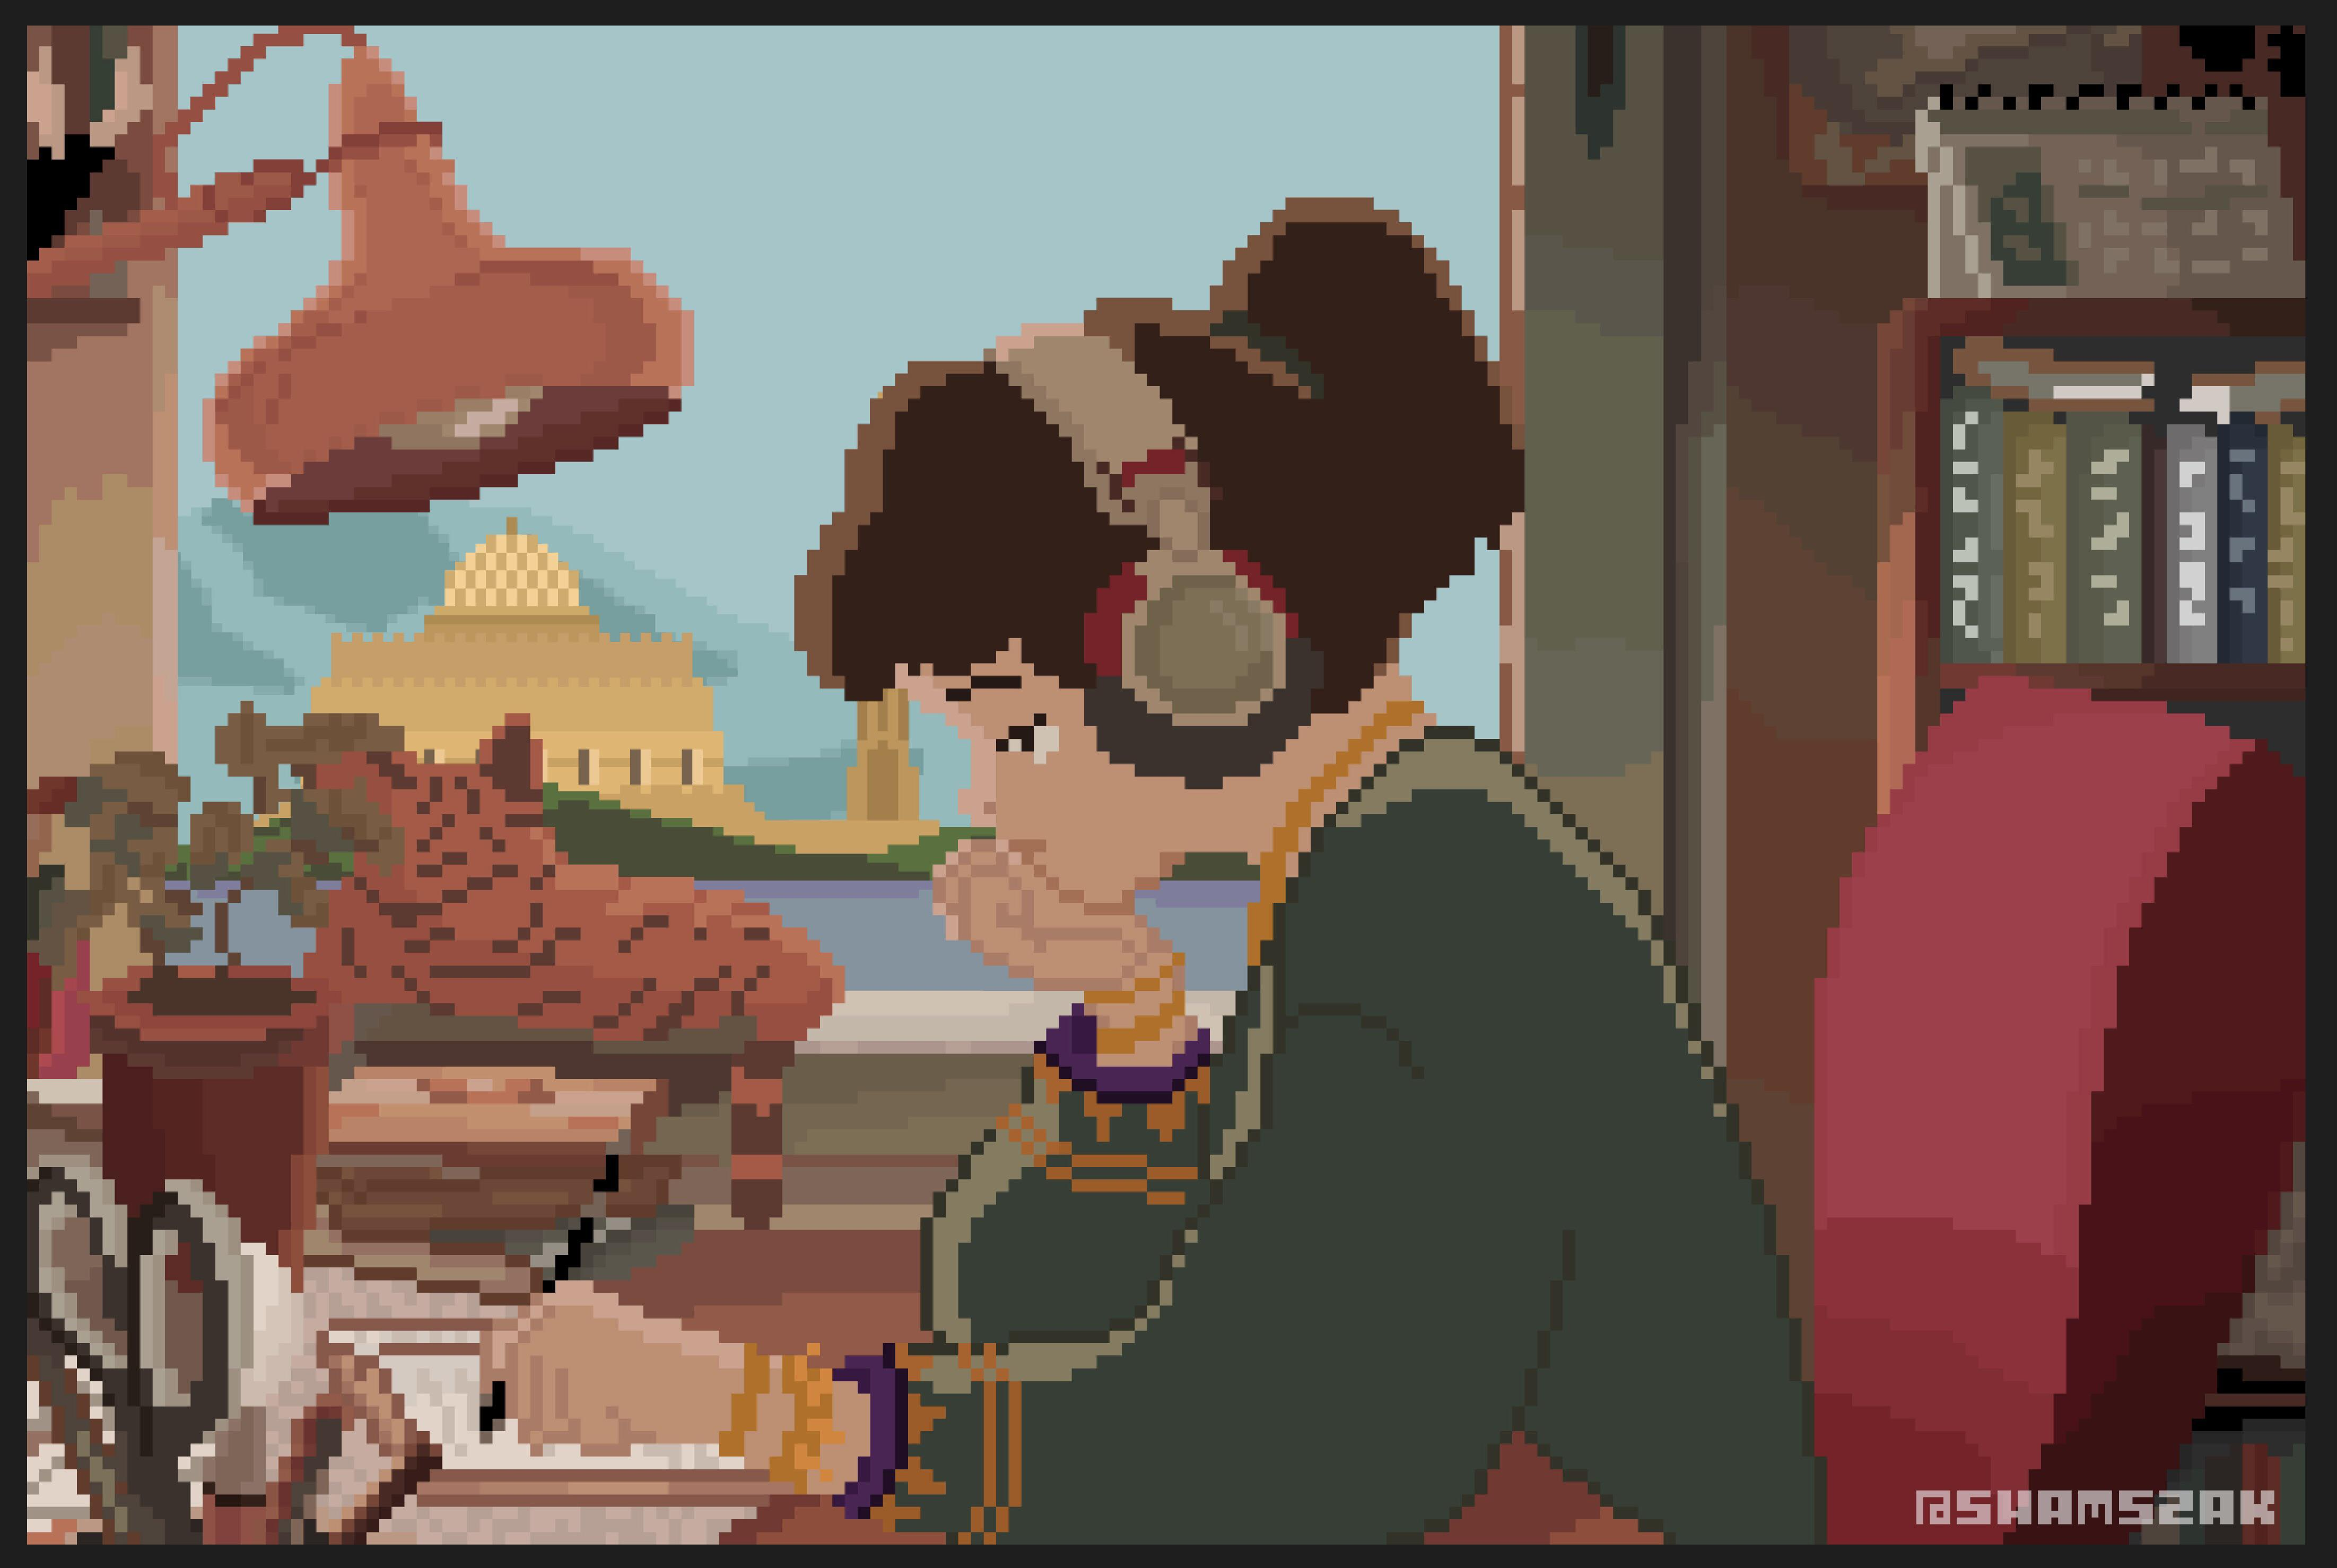 Lo-Fi Girl Oman - عمان - شمس زكواني